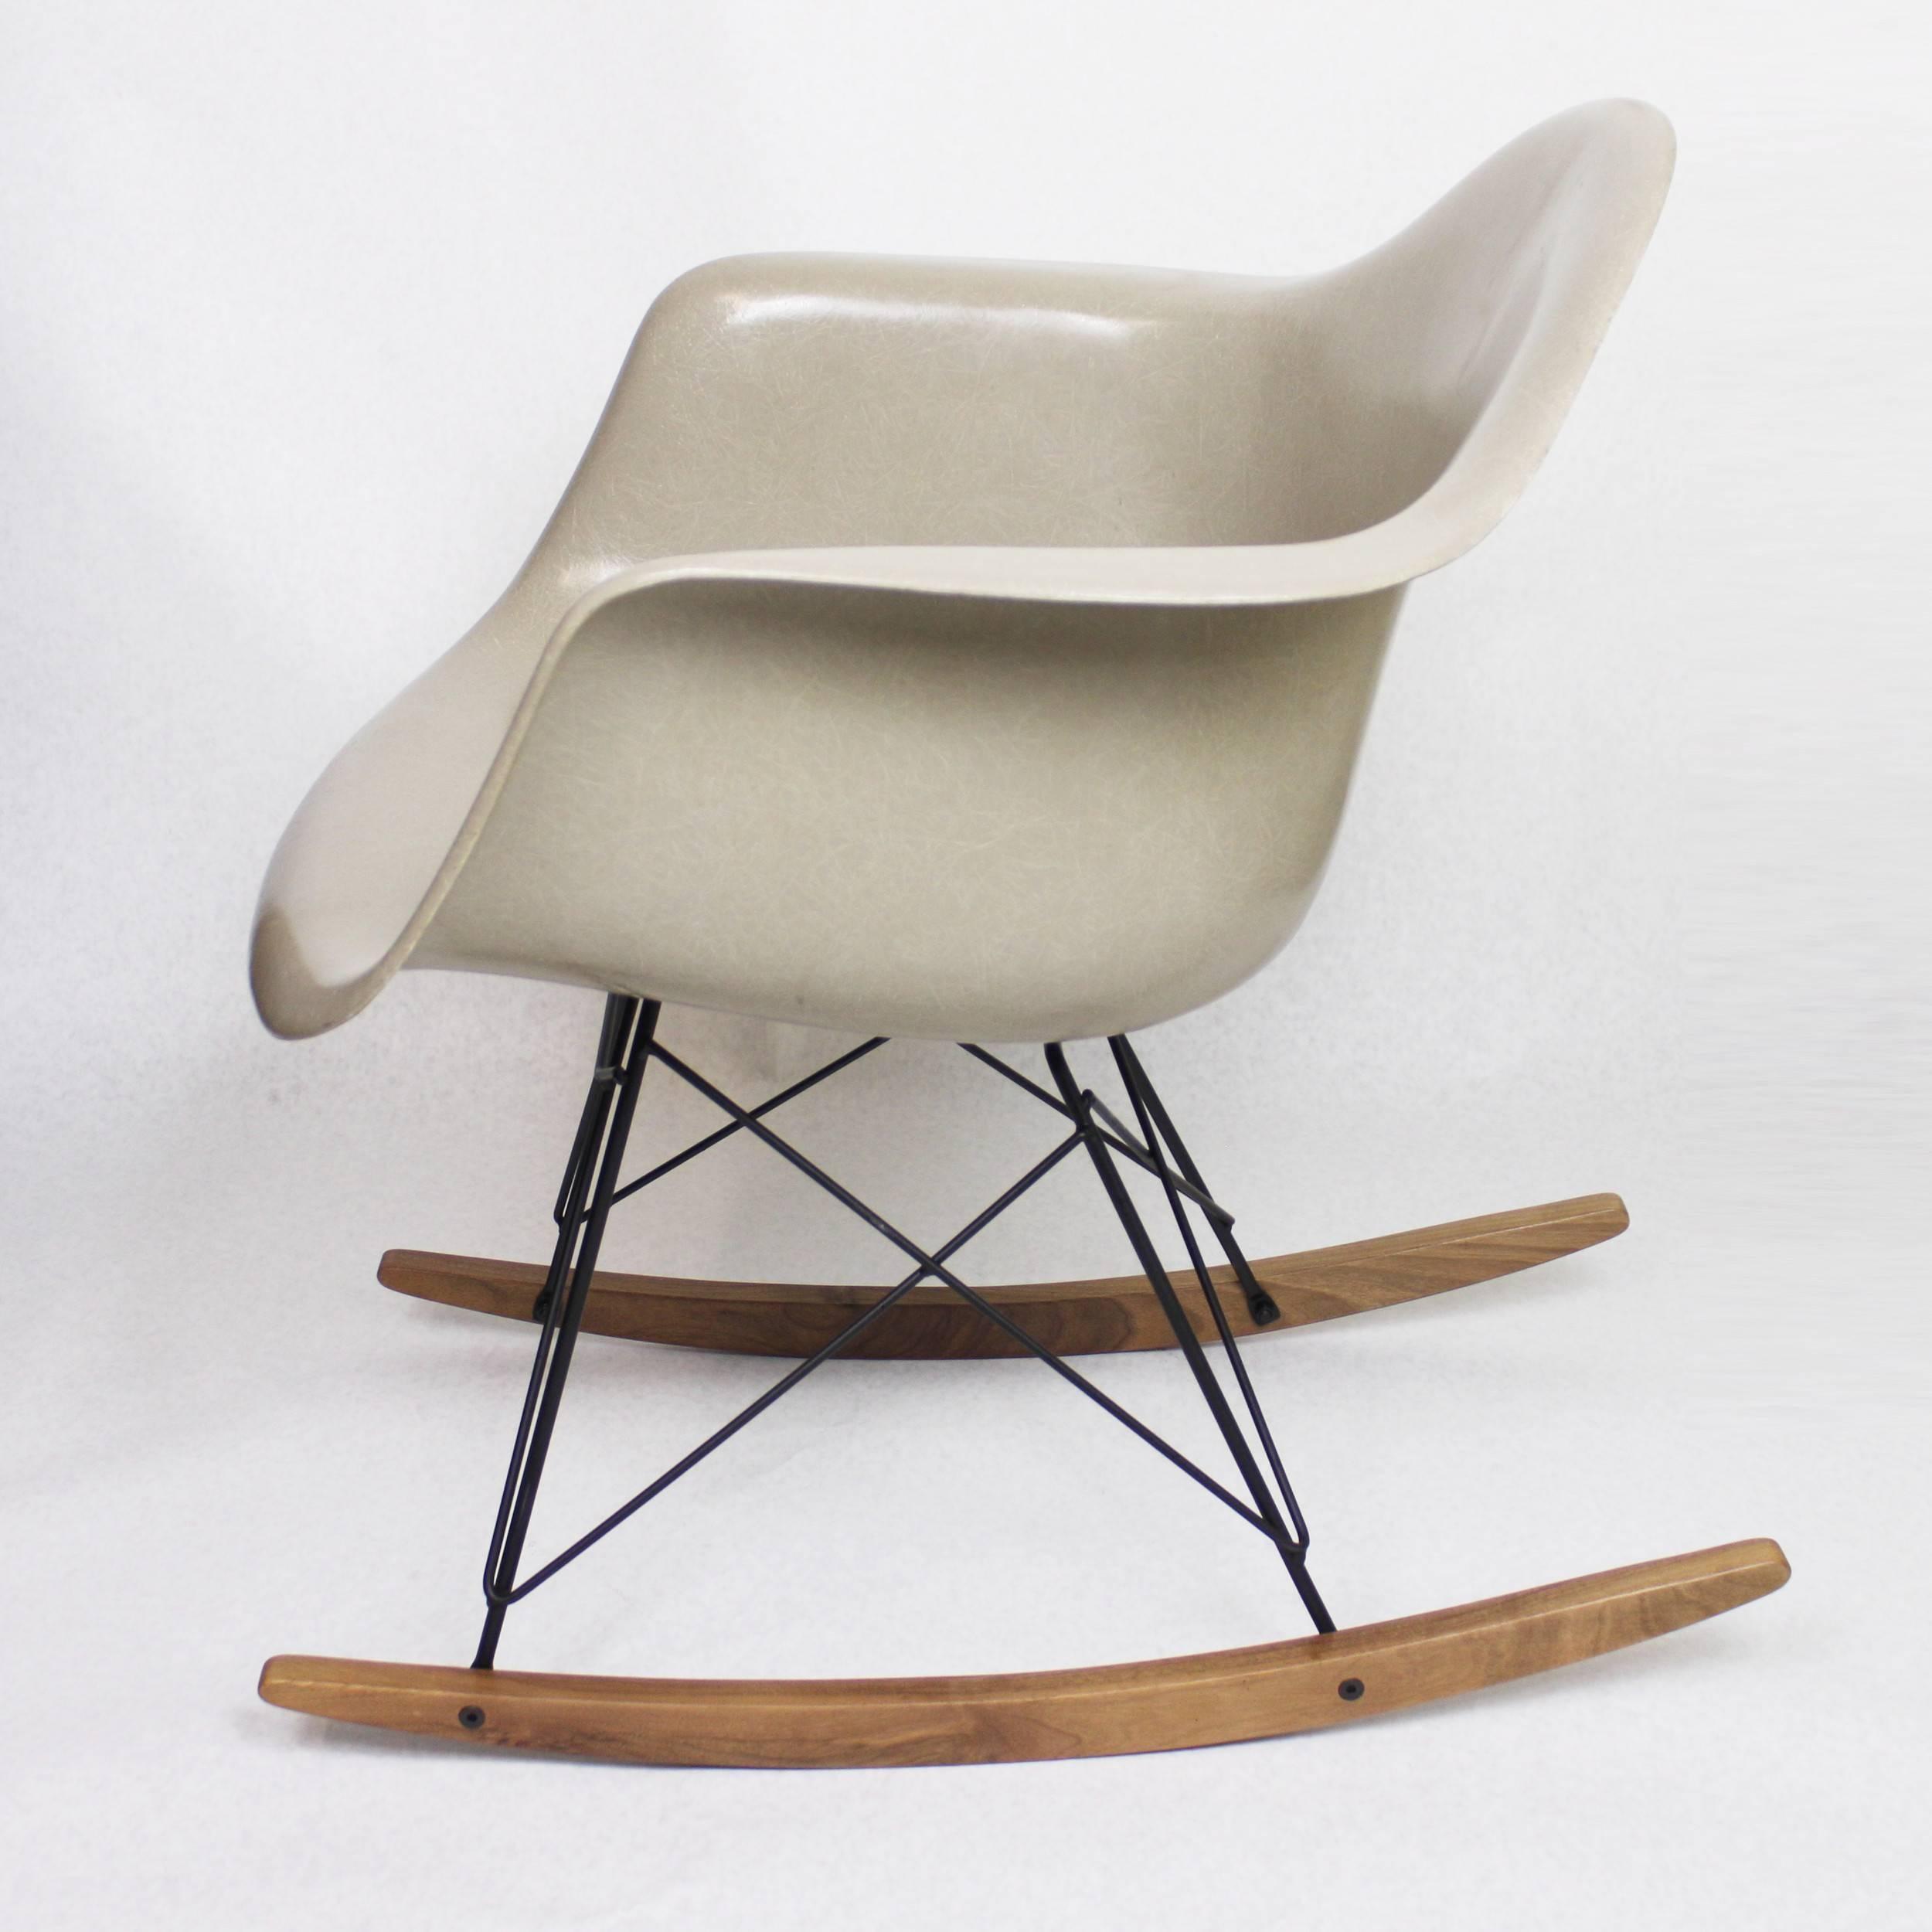 Original Vintage Herman Miller Fiberglass Shell Rocking Chair Rocker In  Greige In Excellent Condition For Sale